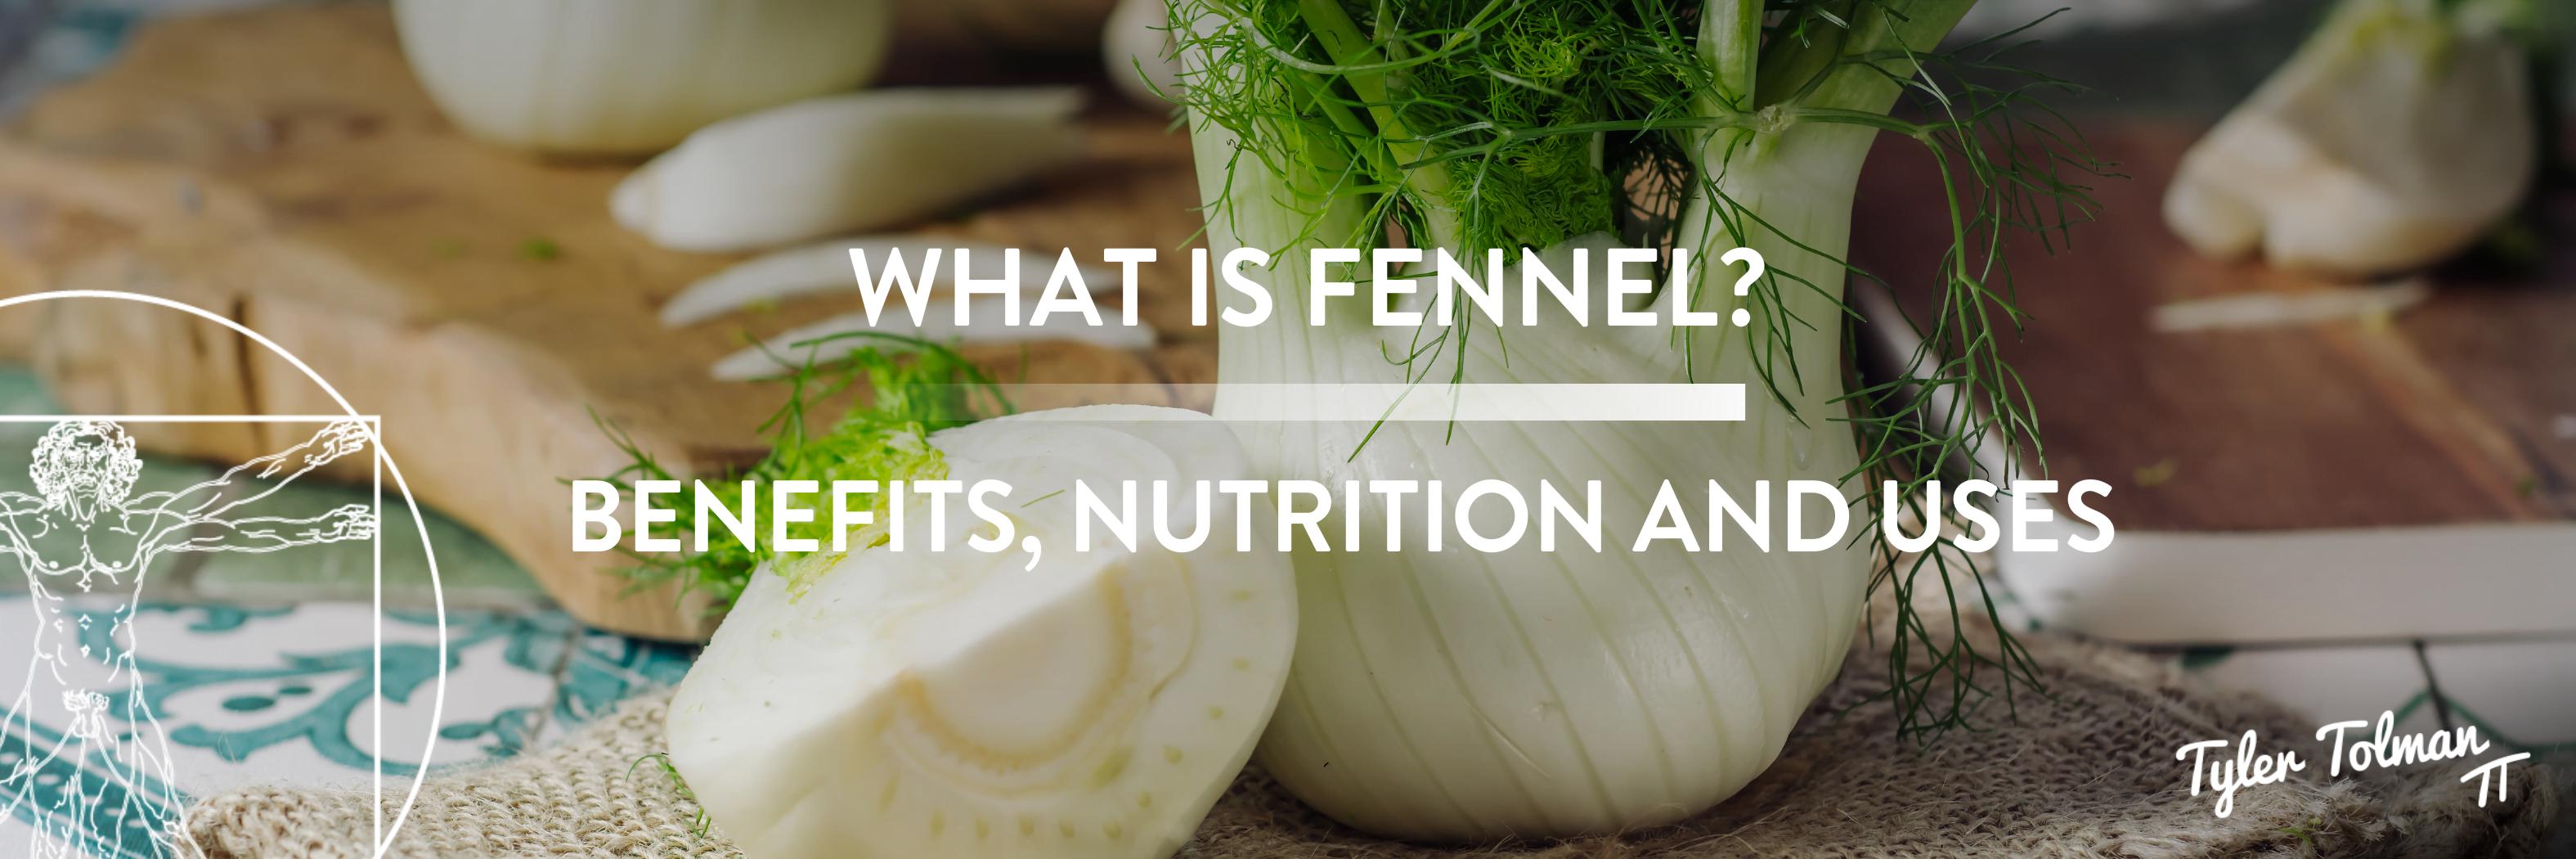 fennel benefits